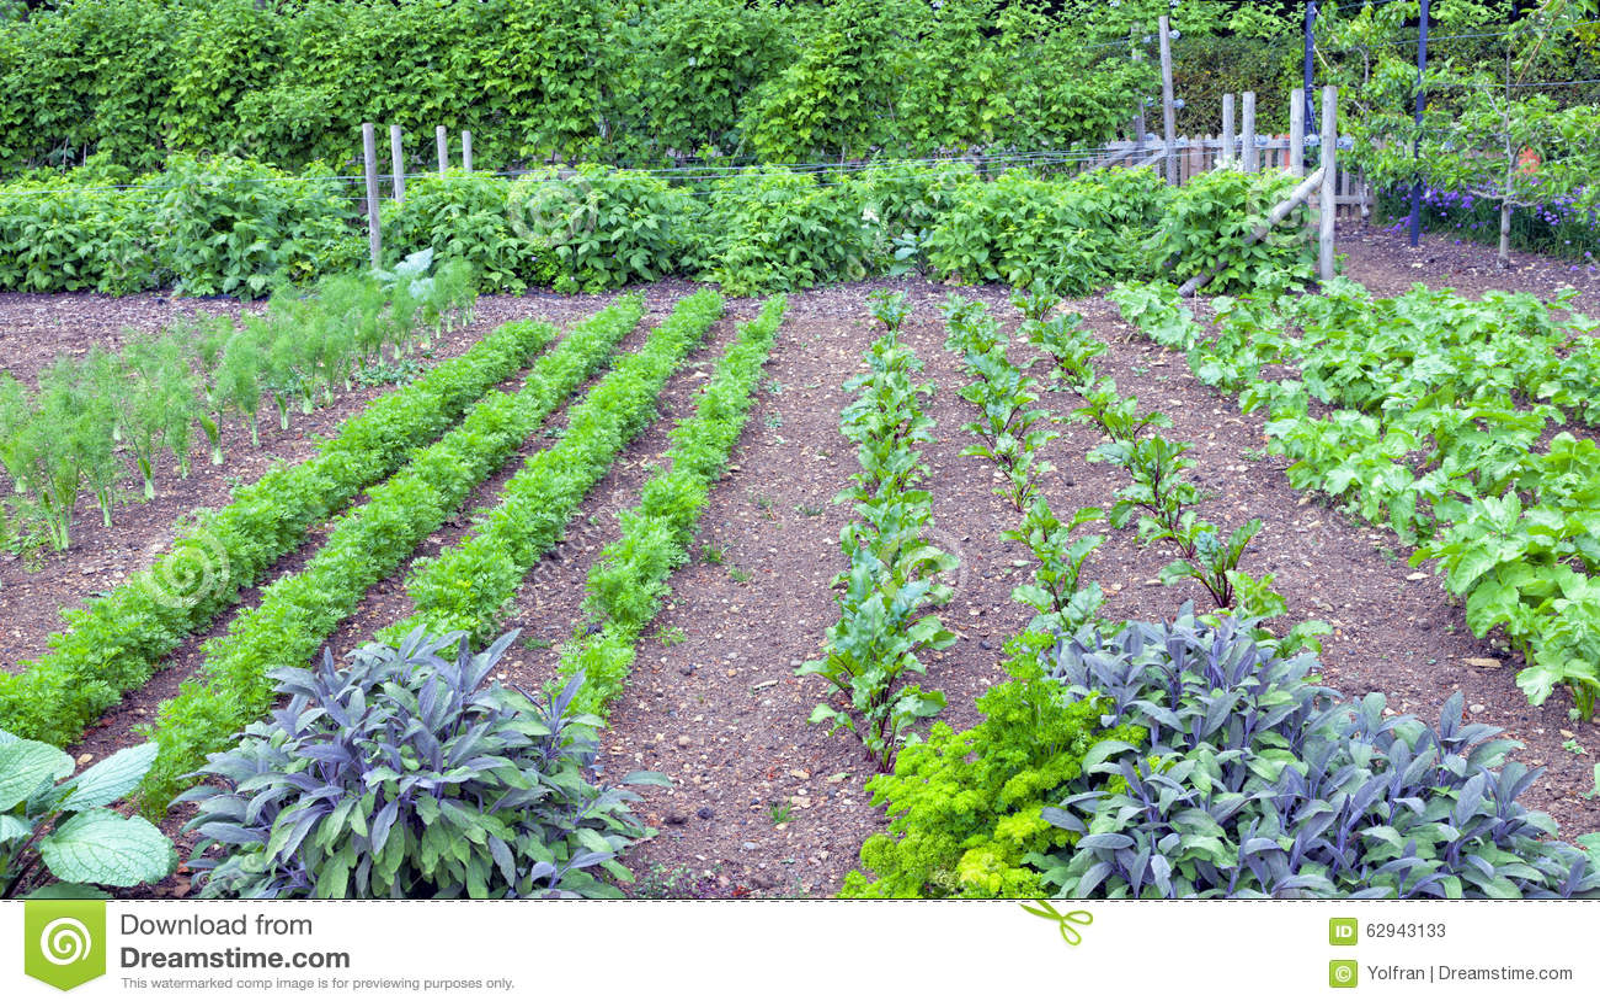 Vegetable garden rows - Royalty Free Stock Photo